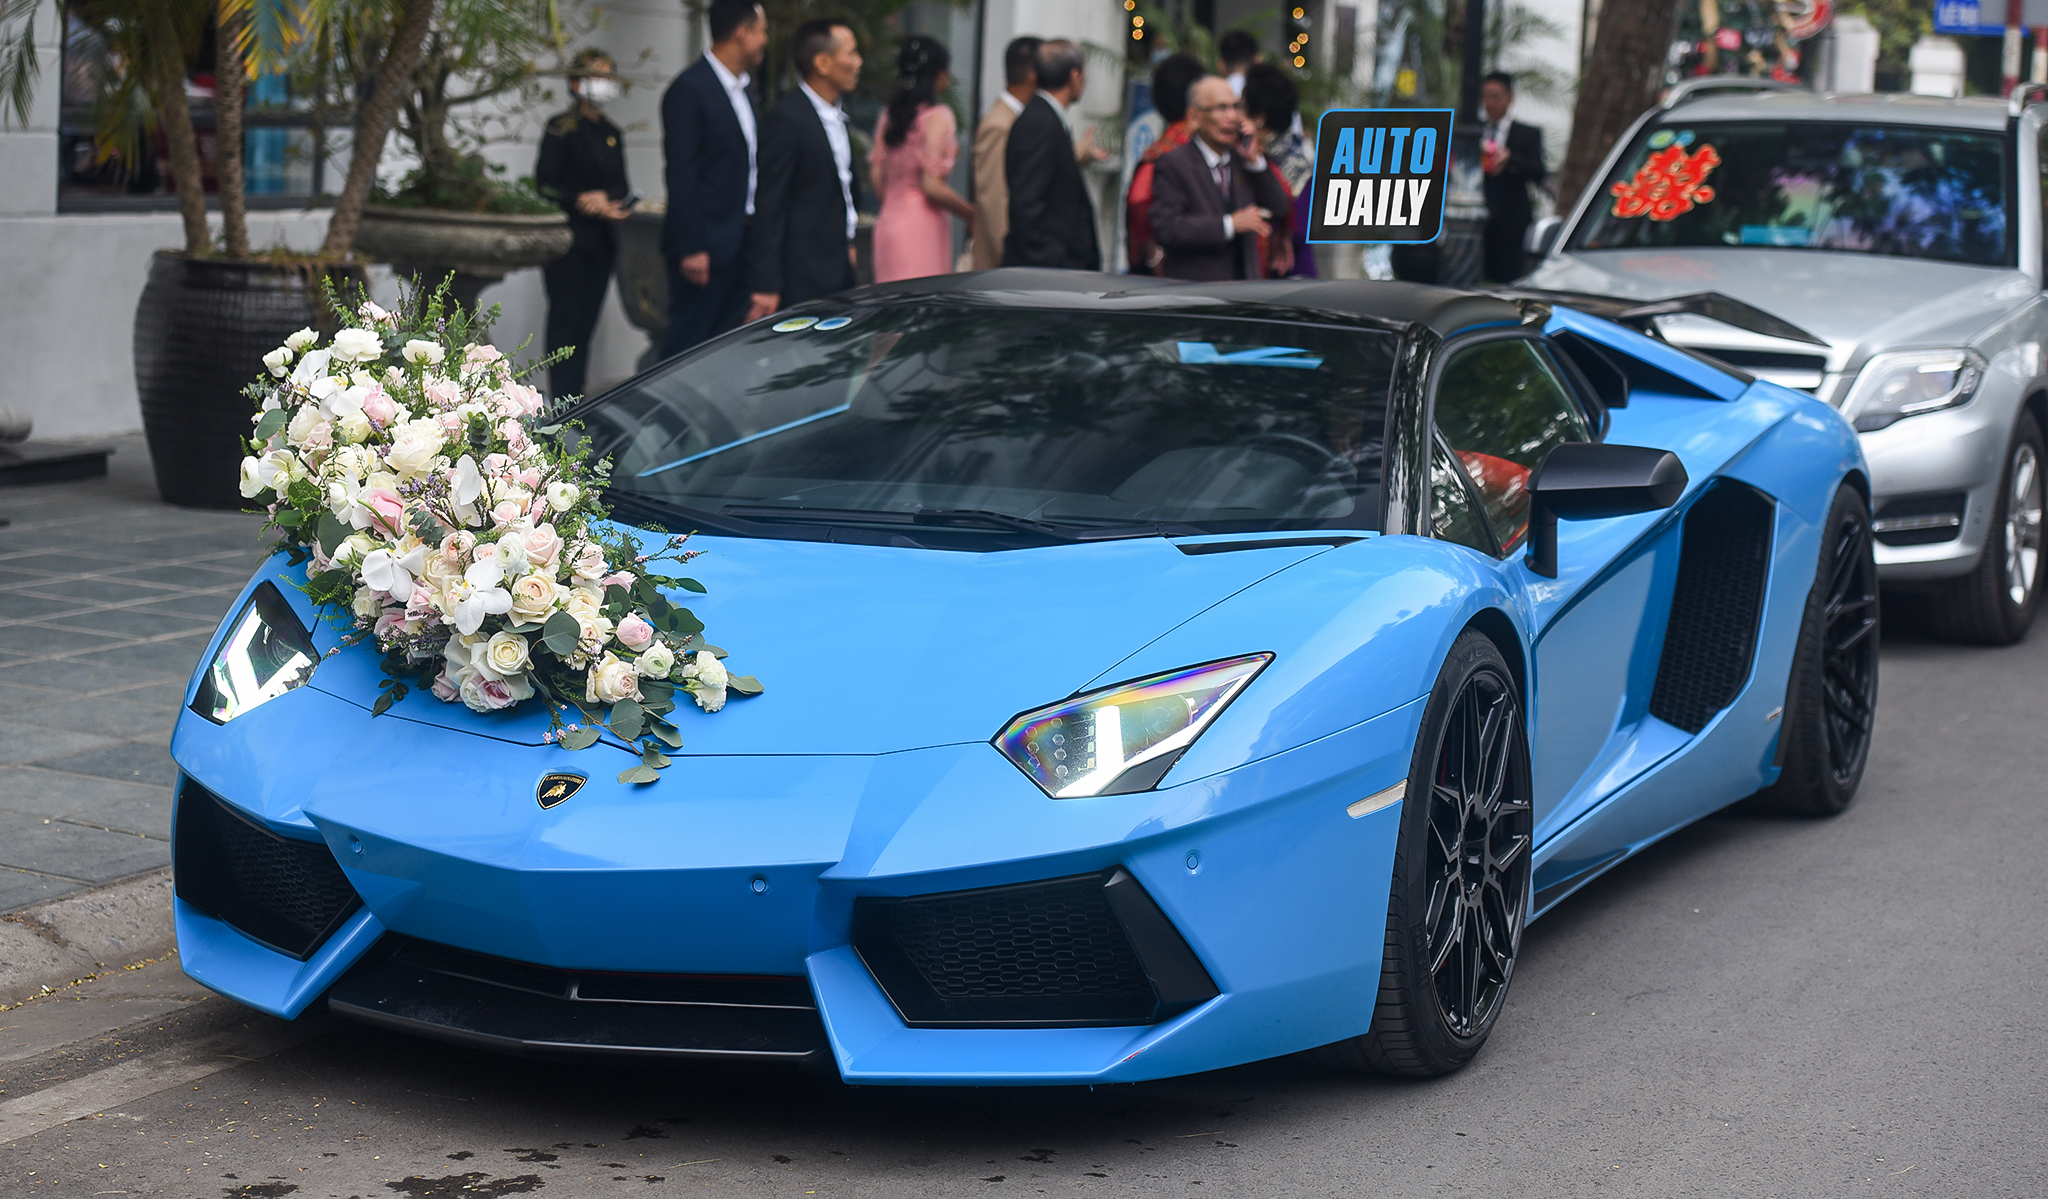 Siêu xe Lamborghini Aventador mui trần làm xe hoa tại Hải Phòng